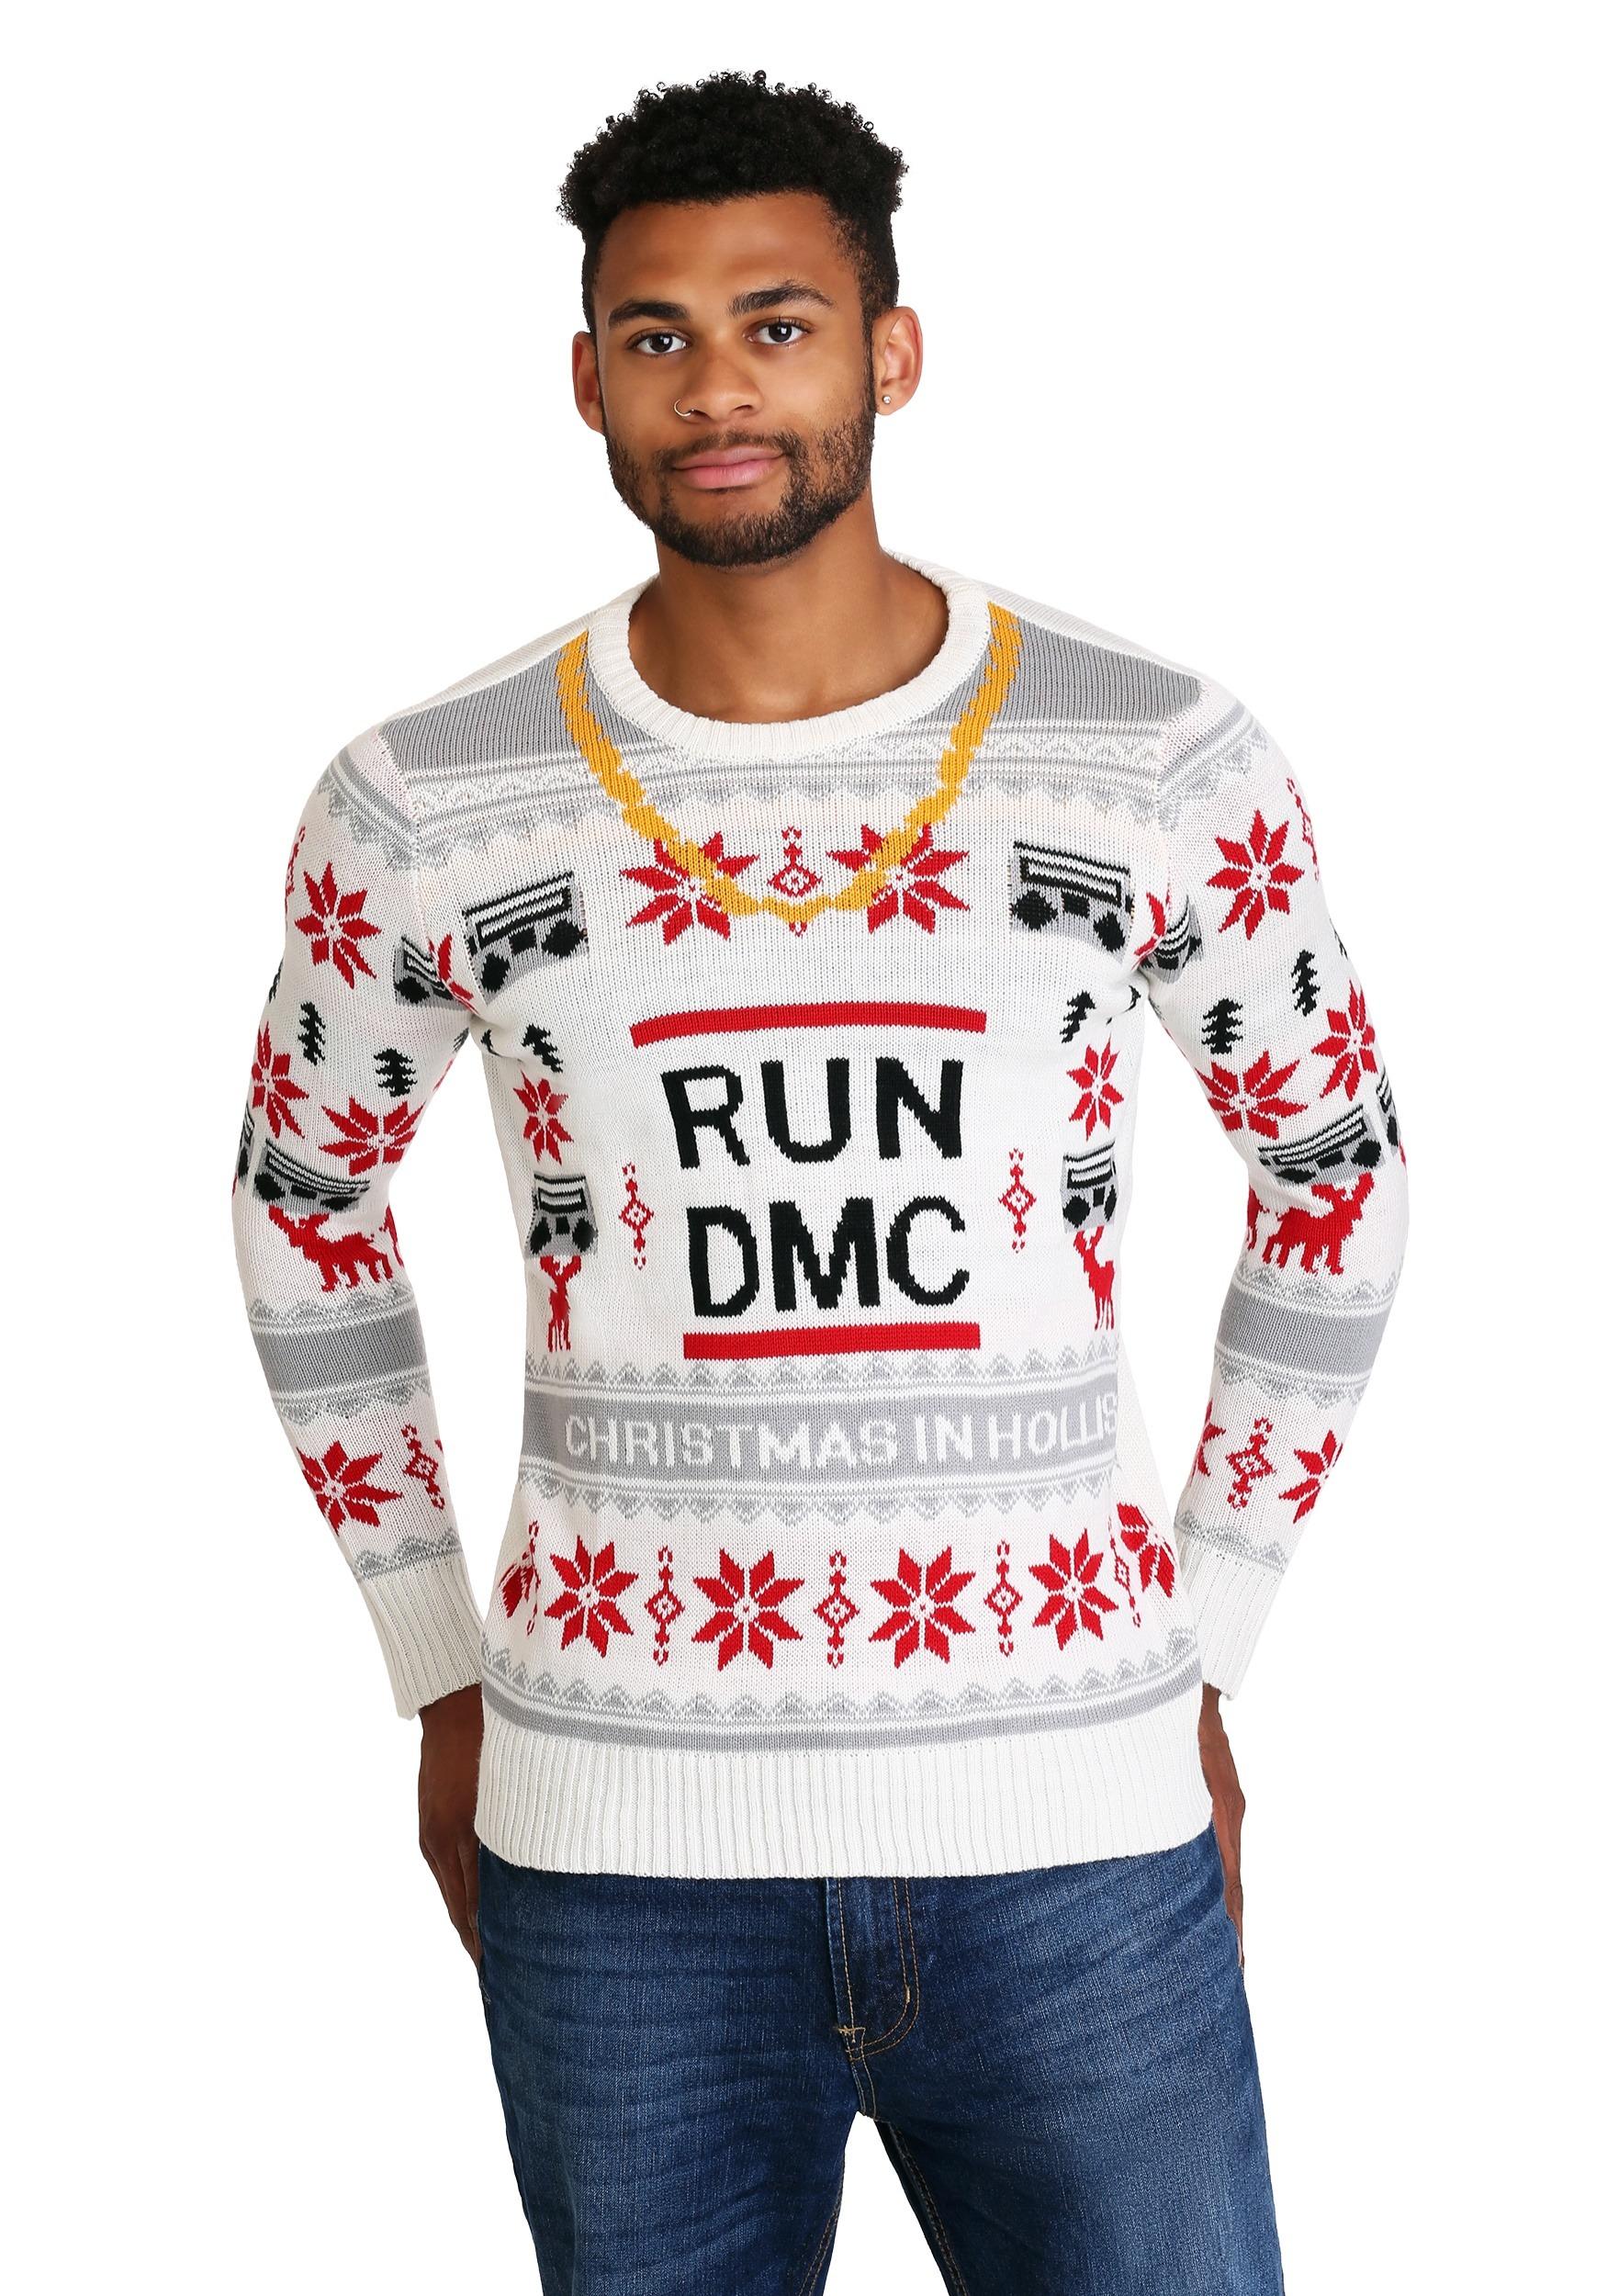 RUN DMC Ugly Christmas Sweater